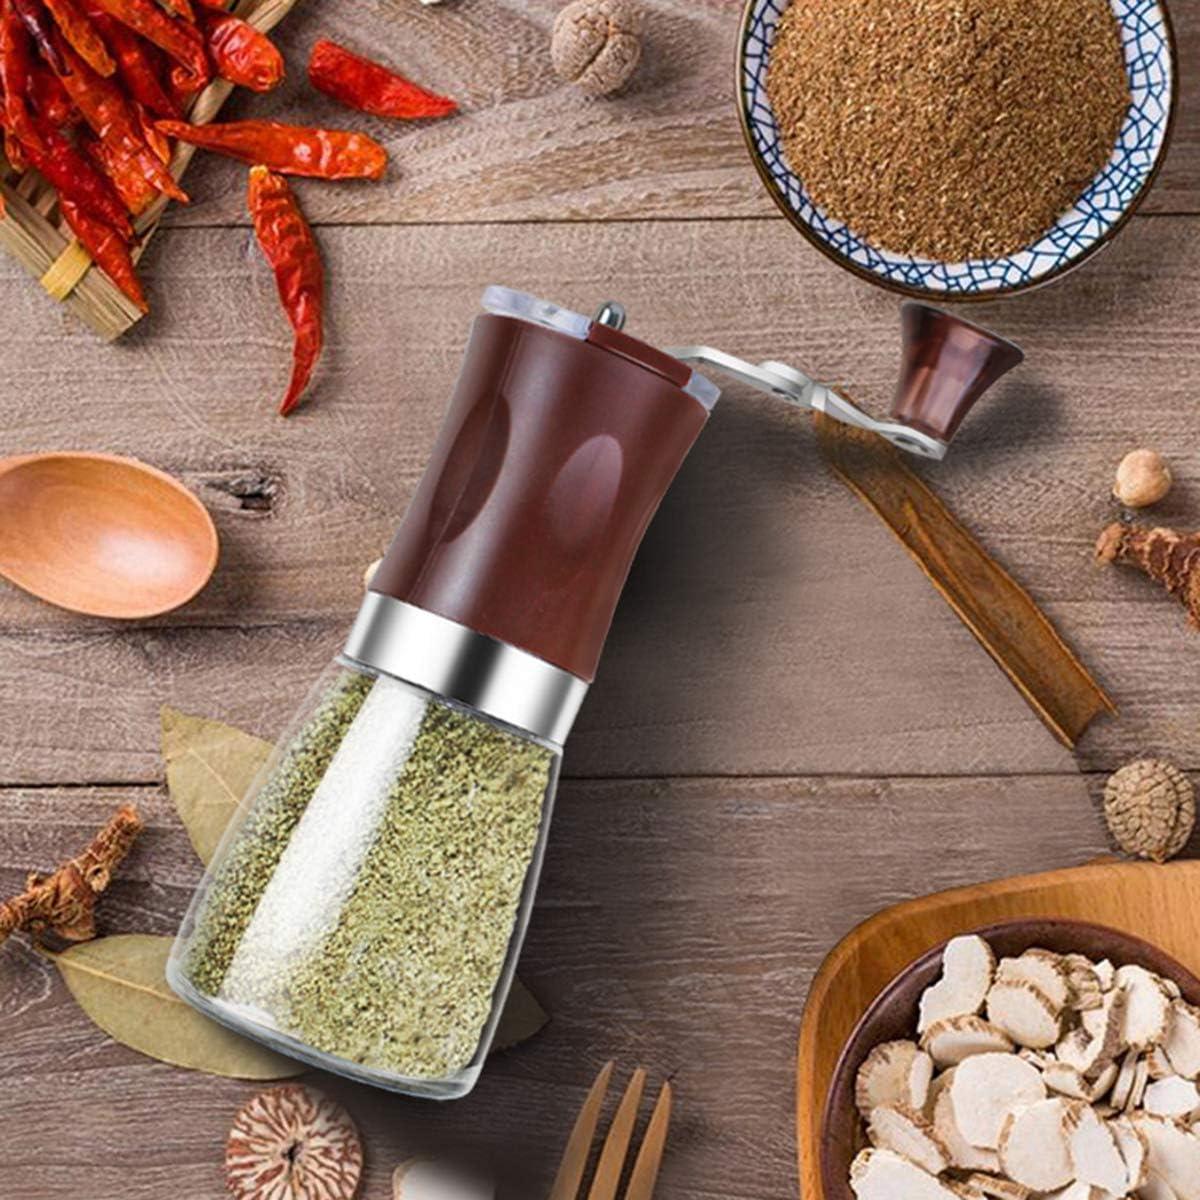 Salt and Pepper Grinder Set Manual Pepper and Salt Mill with Crank Handle with Glass Bottle Salt Grinder Adjustable Coarseness Salt and Pepper Shakers for Barbecue,Coffee Beans or Dinner,Brown